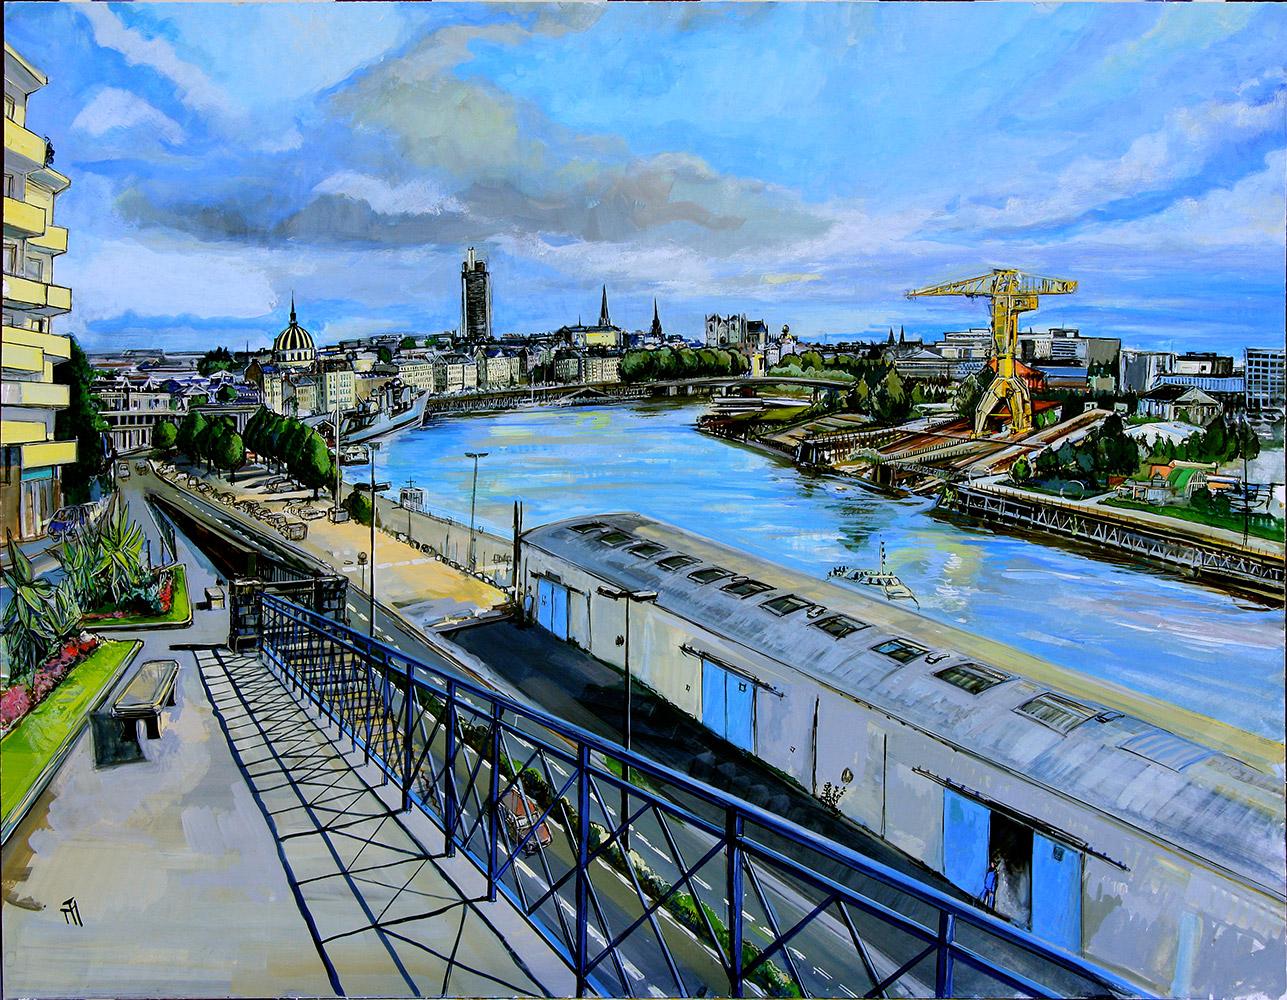 La Ville en Pente Haut Chantenay - Michel Tual